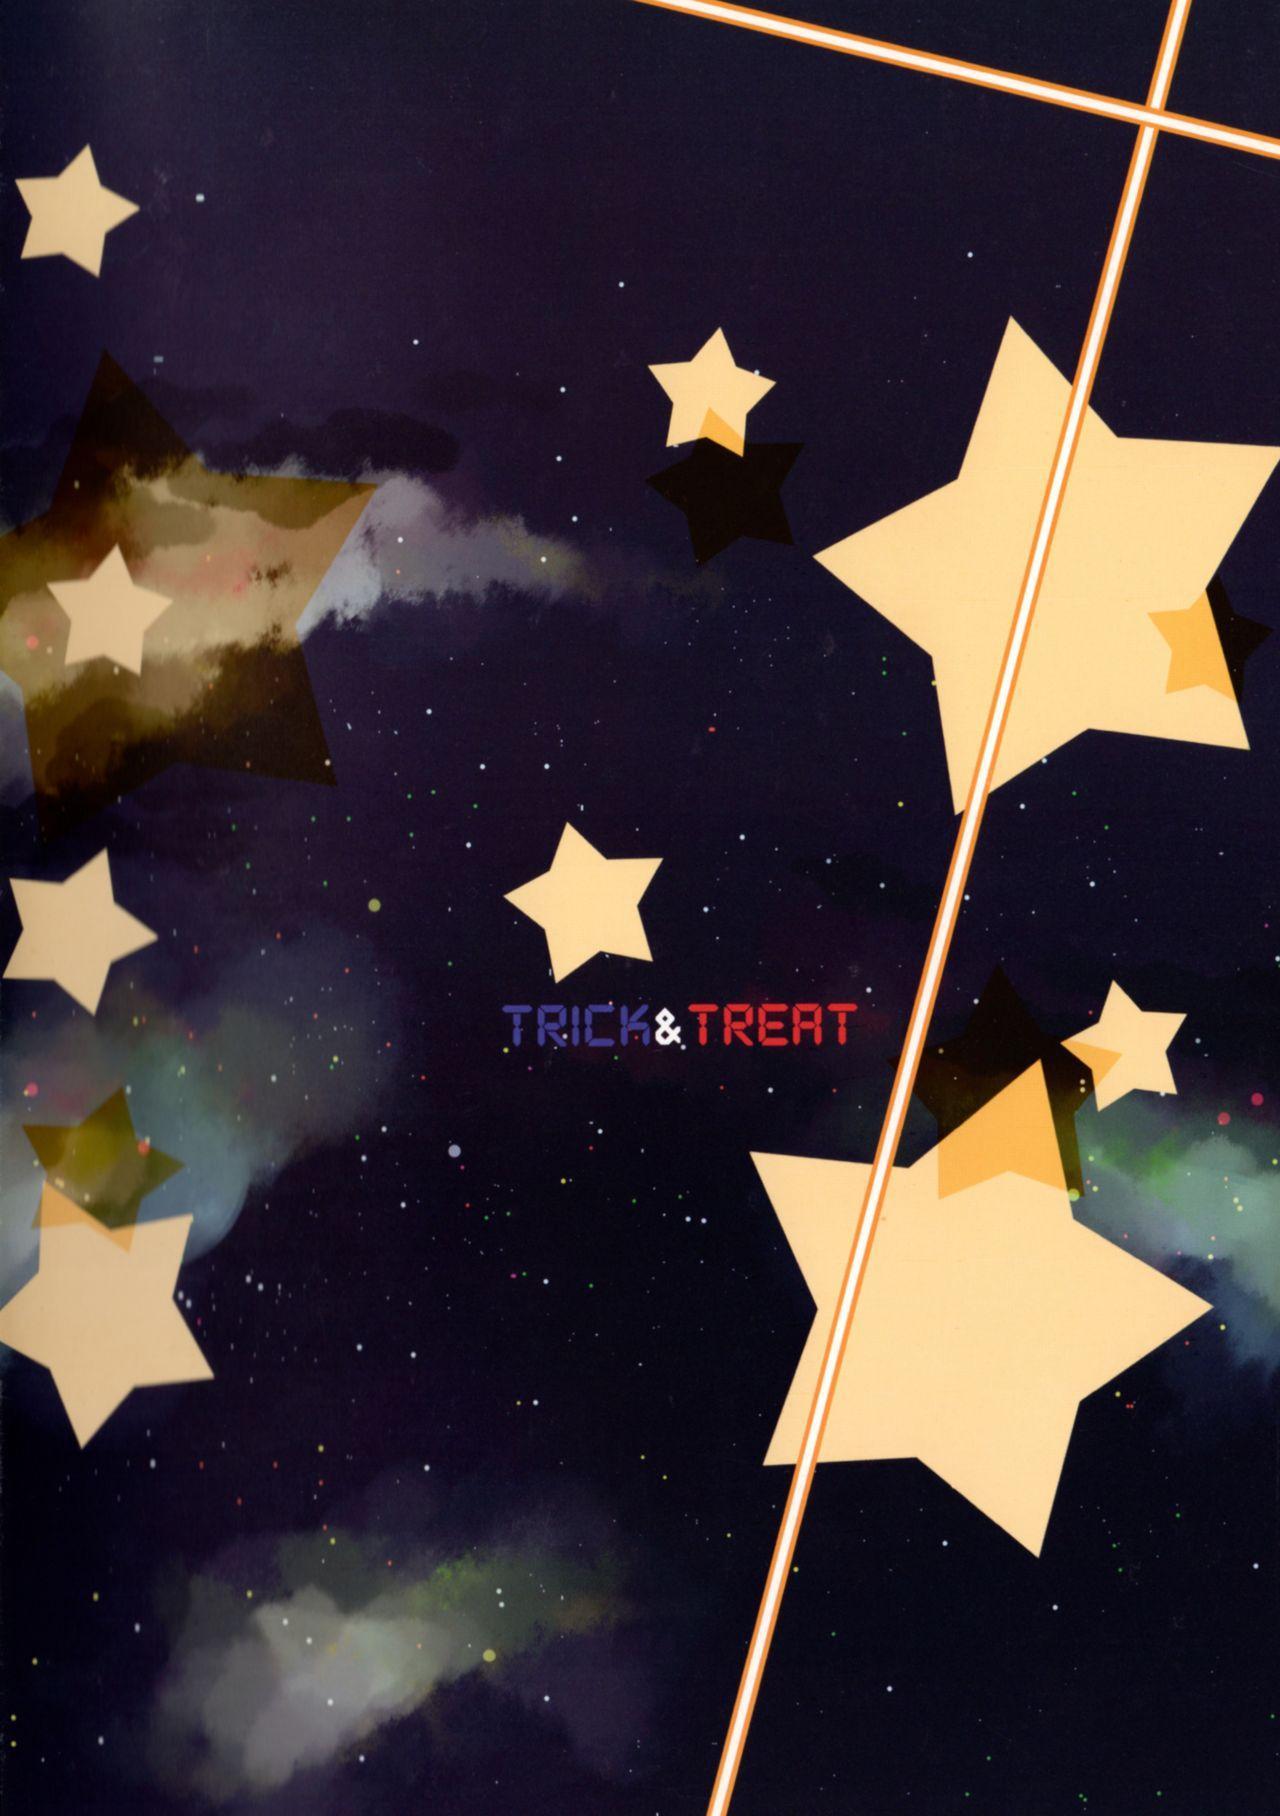 Trick_Effect_2 19